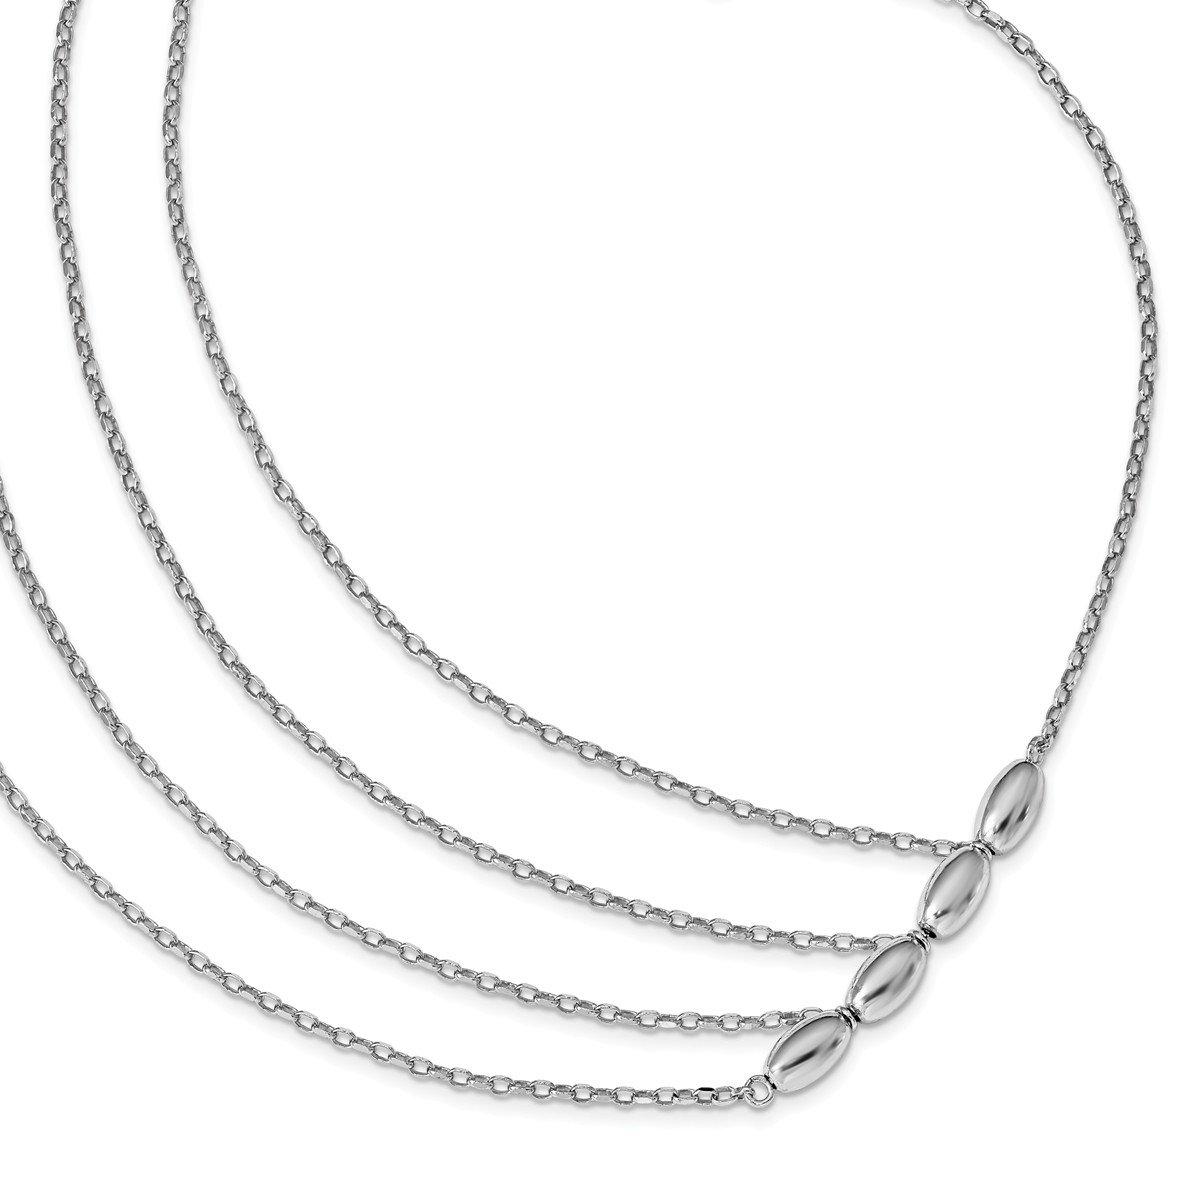 Leslie's Italian 925 Sterling Silver Polished 3 strand 17'' necklace